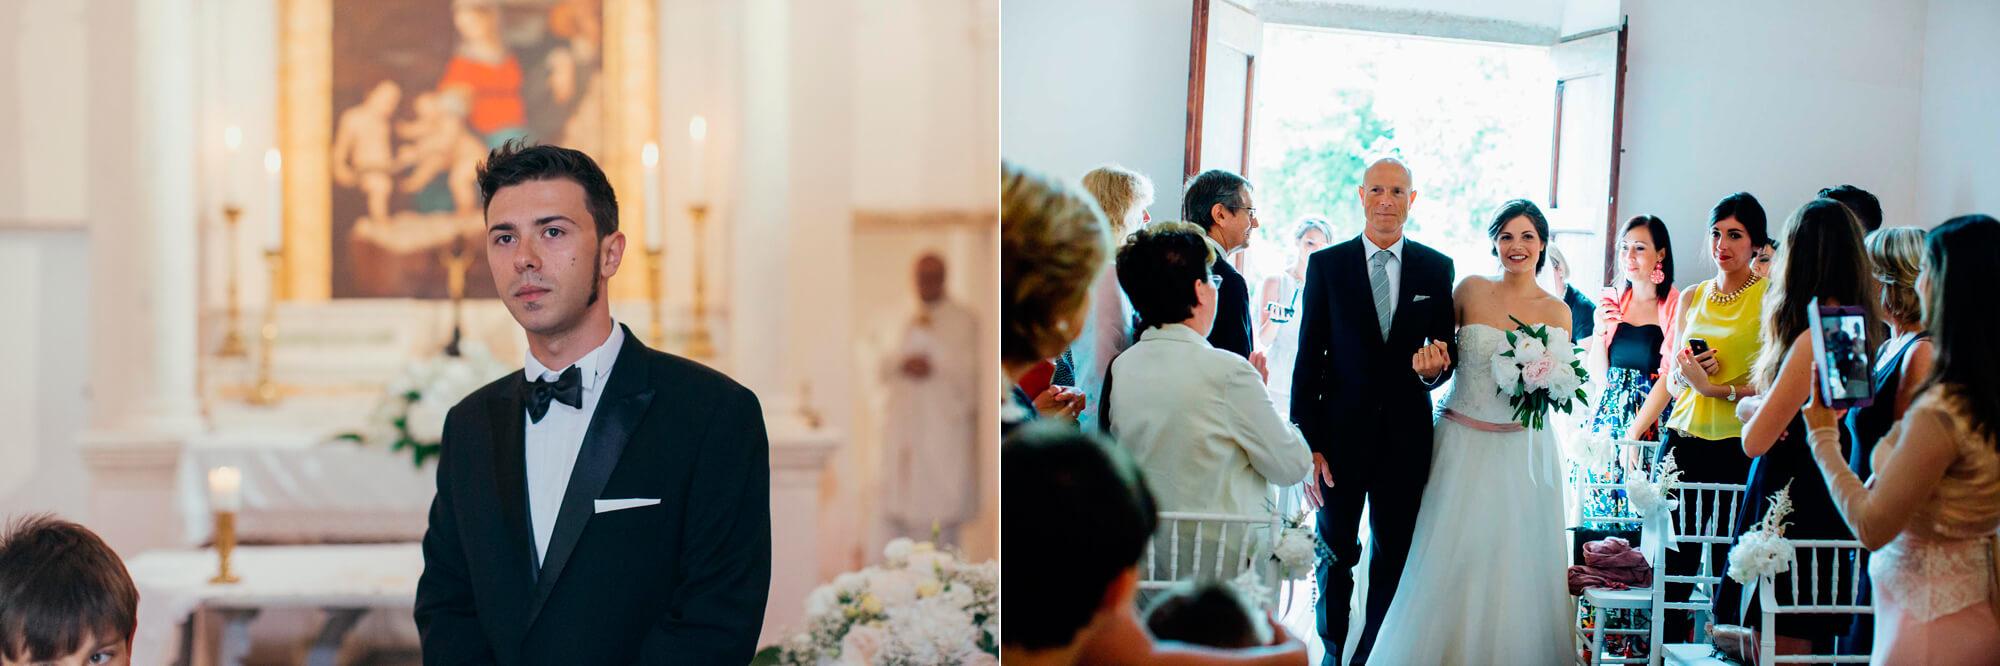 058-arezzo-wedding-photographer.jpg